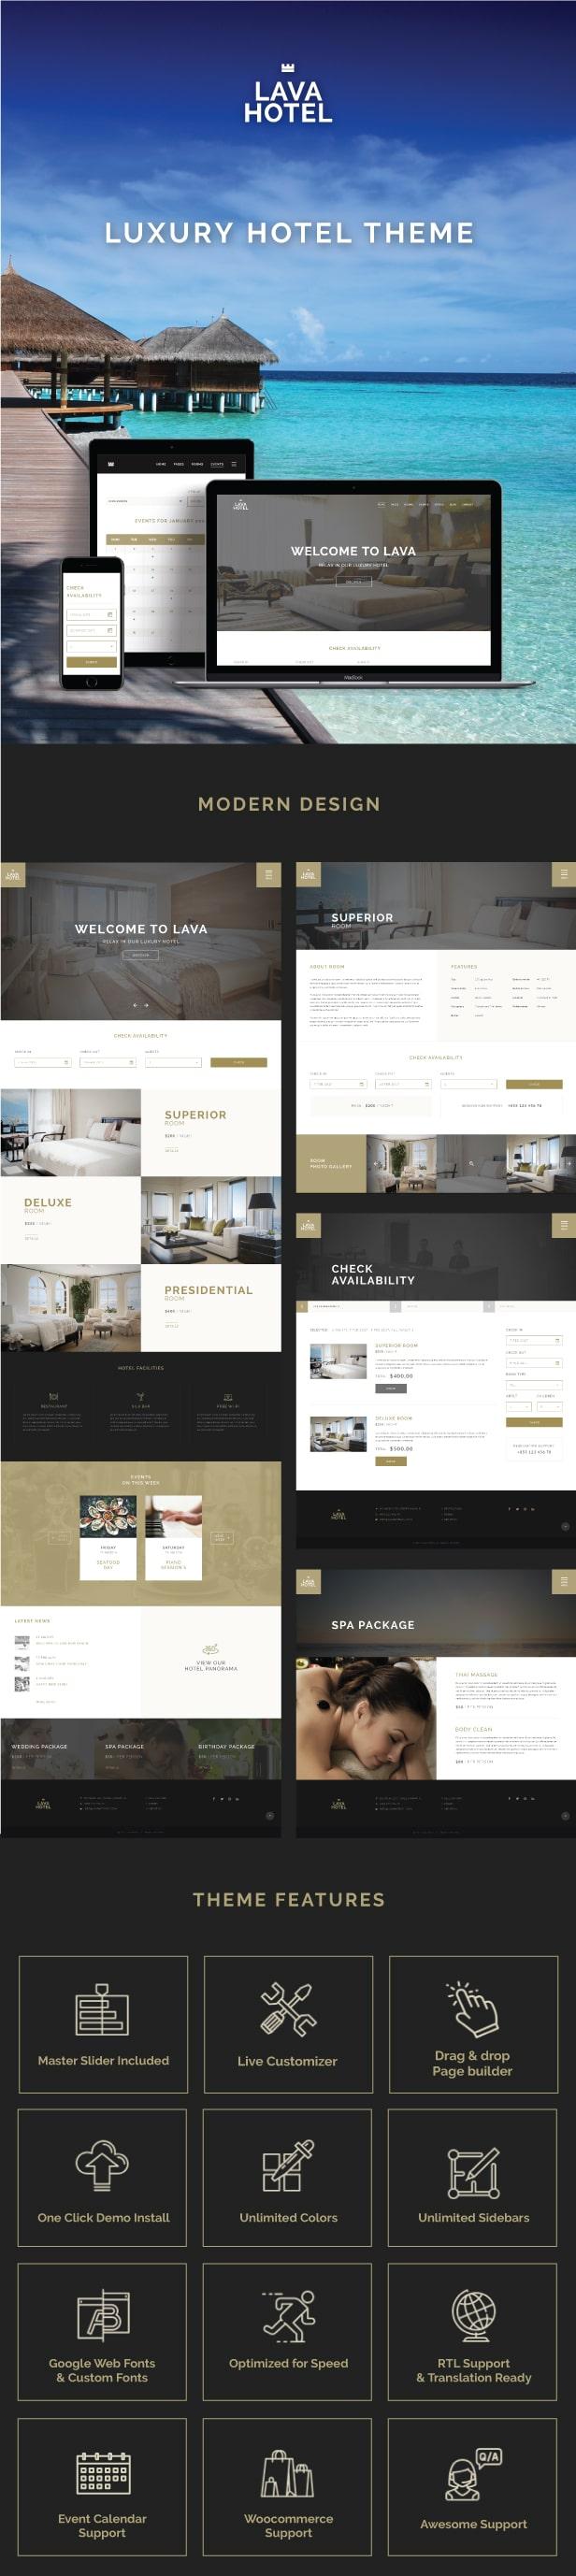 Lava - Luxury Hotel WordPress Theme - 3